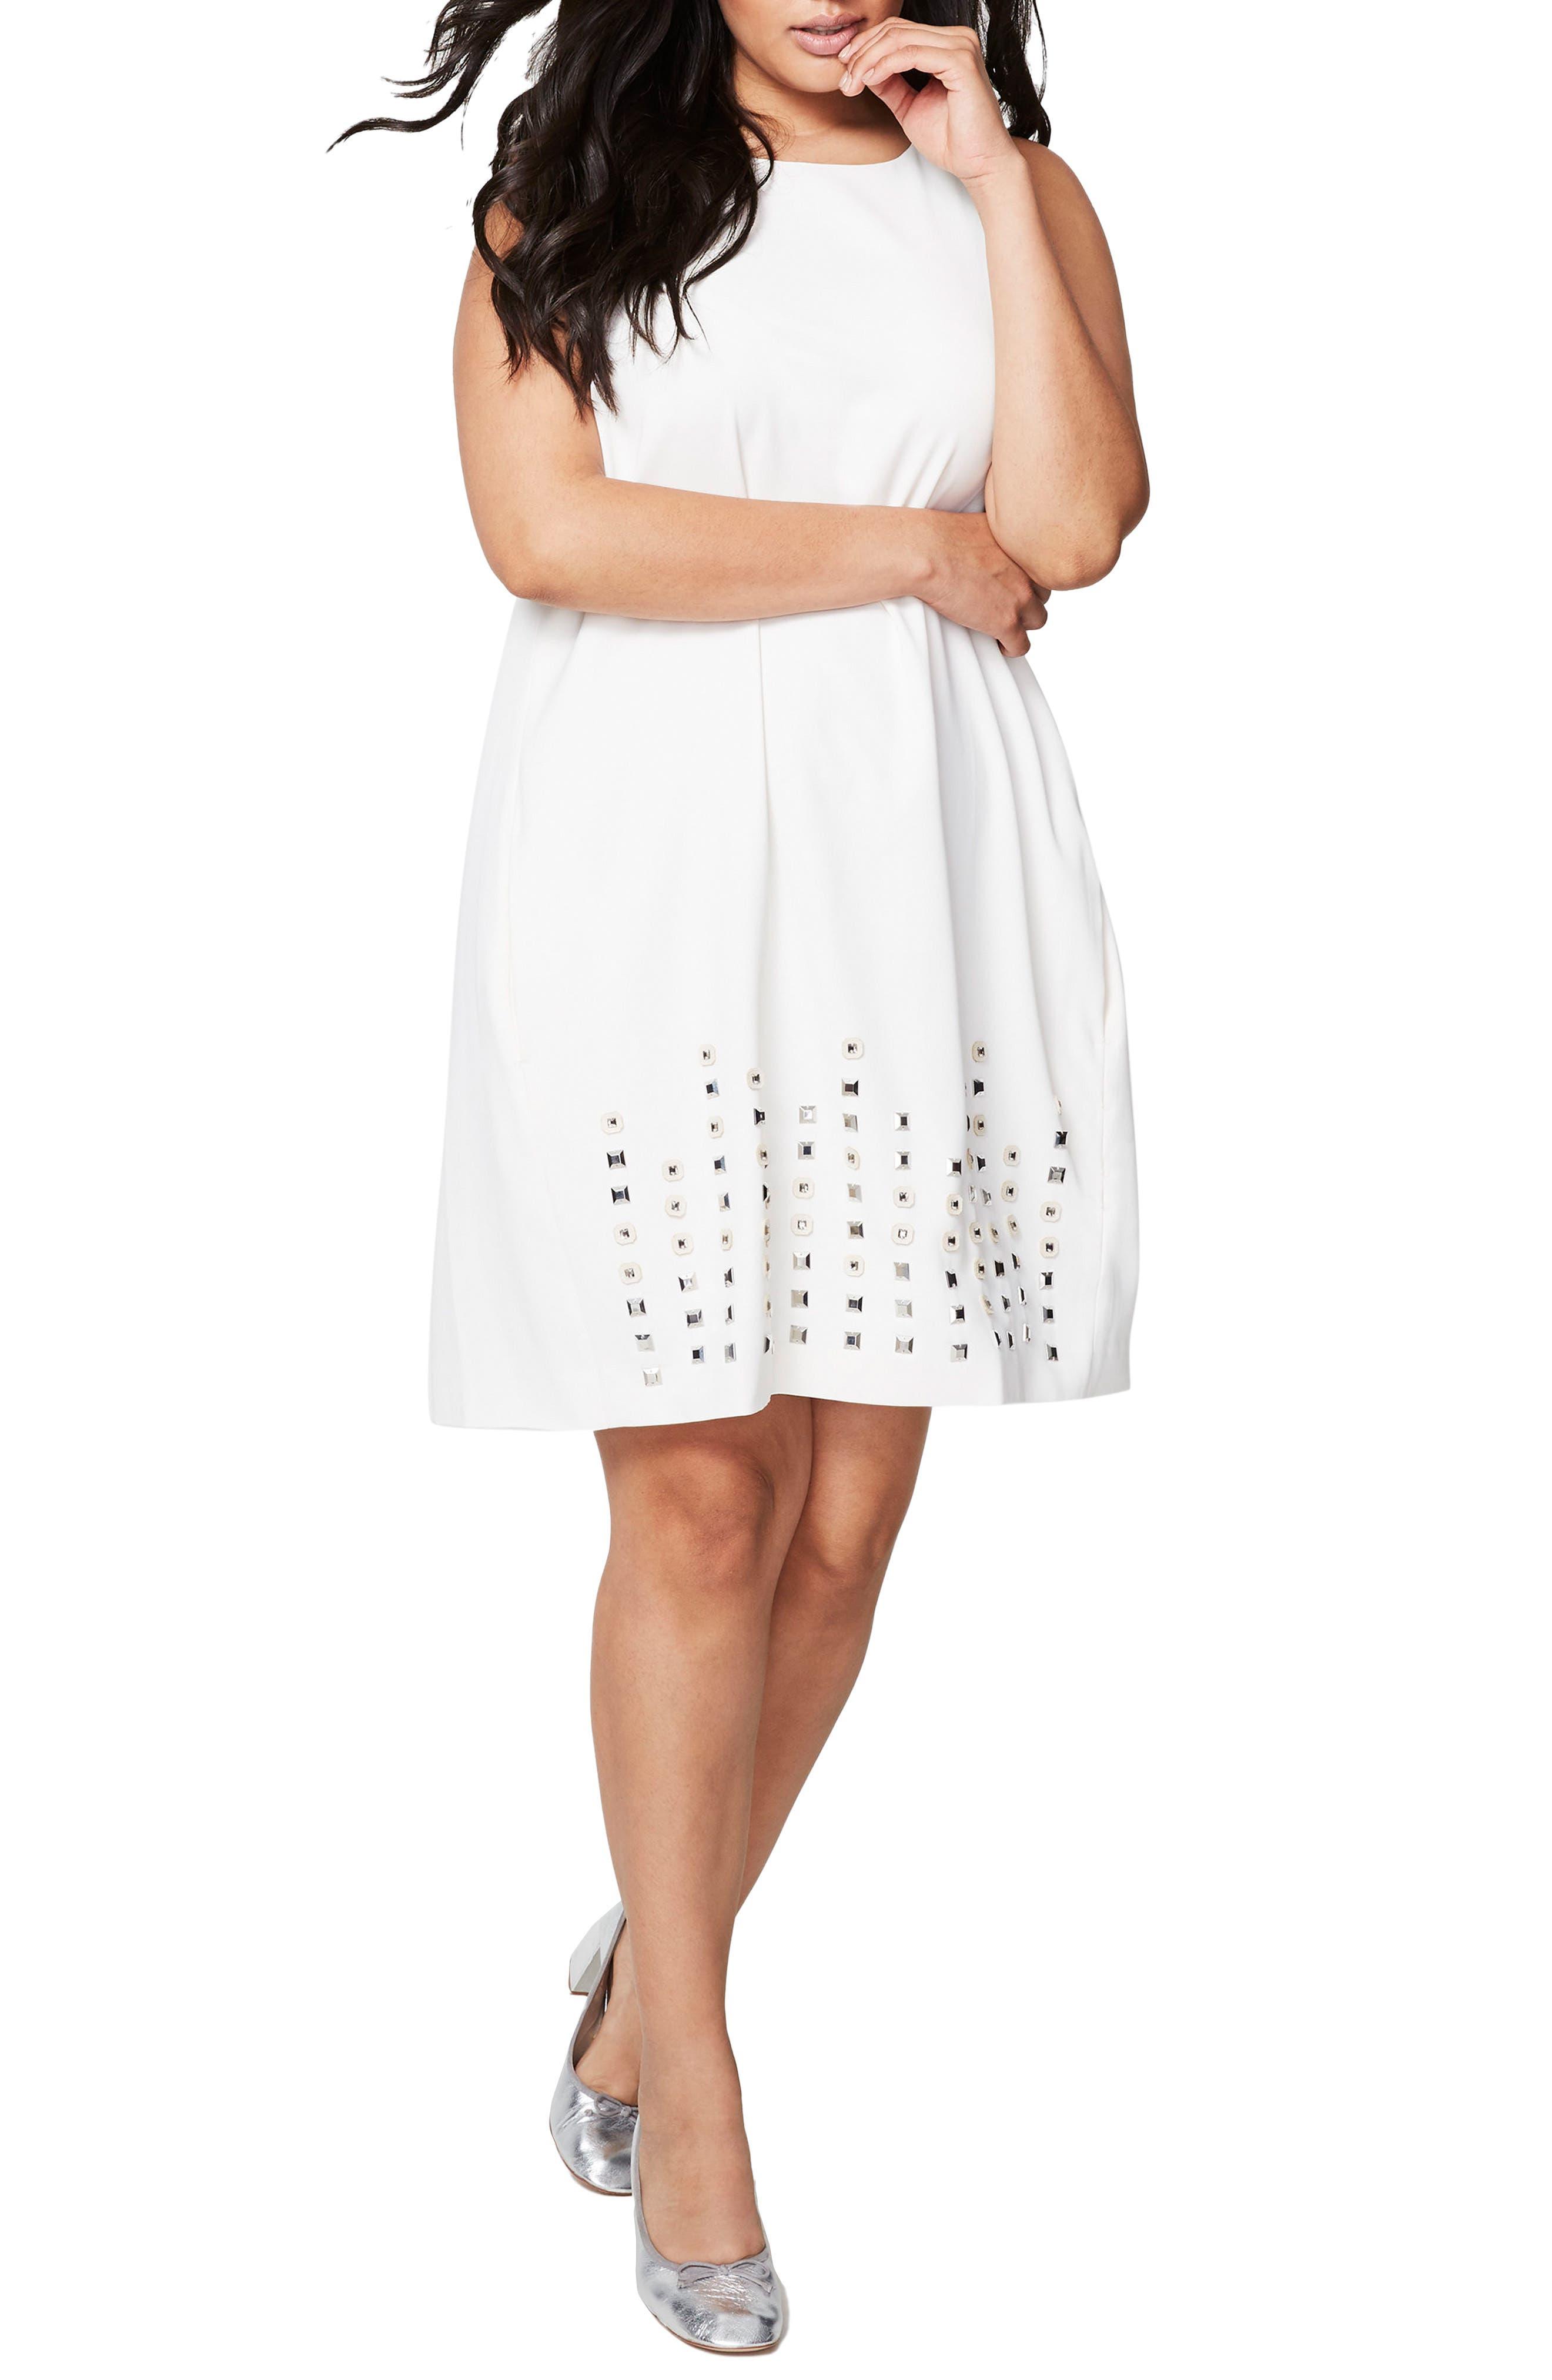 Alternate Image 1 Selected - RACHEL Rachel Roy Embellsihed Shift Dress (Plus Size)